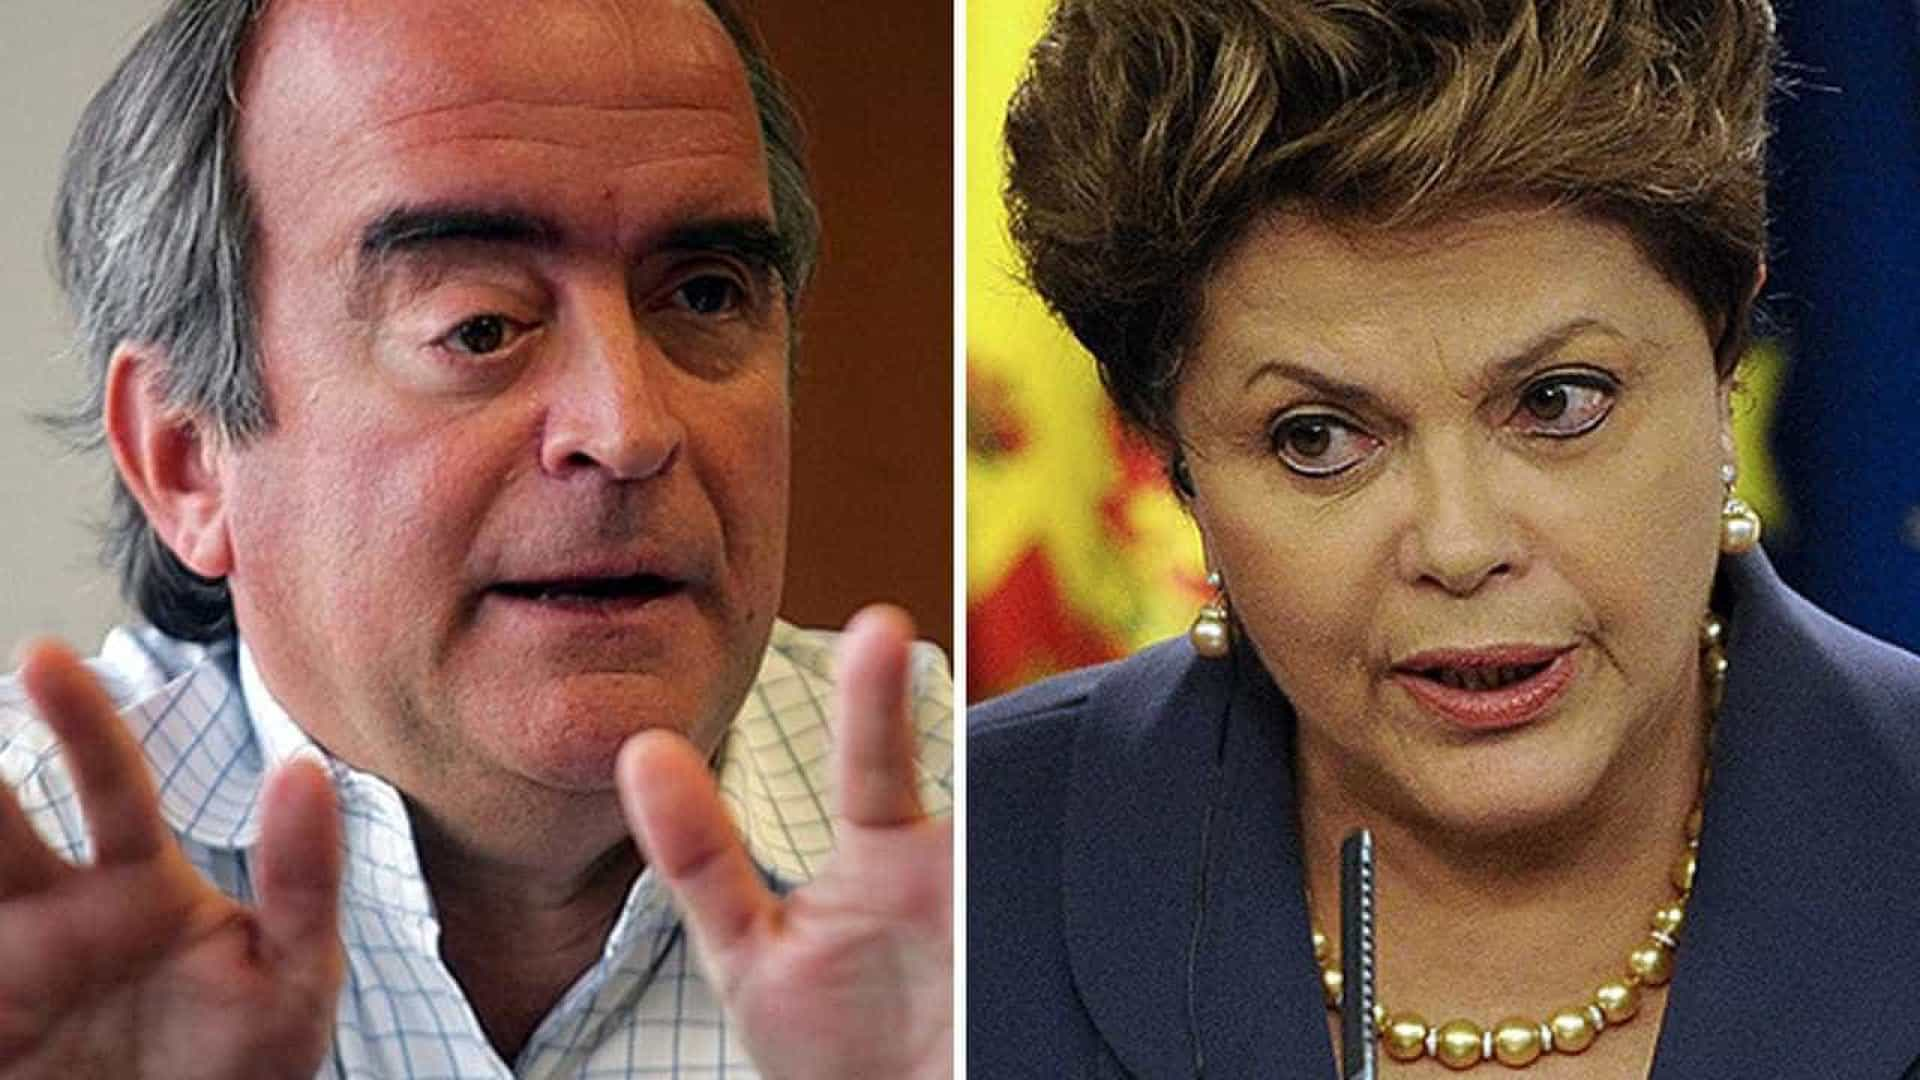 Cerveró cita Dilma e Planalto acredita que  pode influenciar impeachment